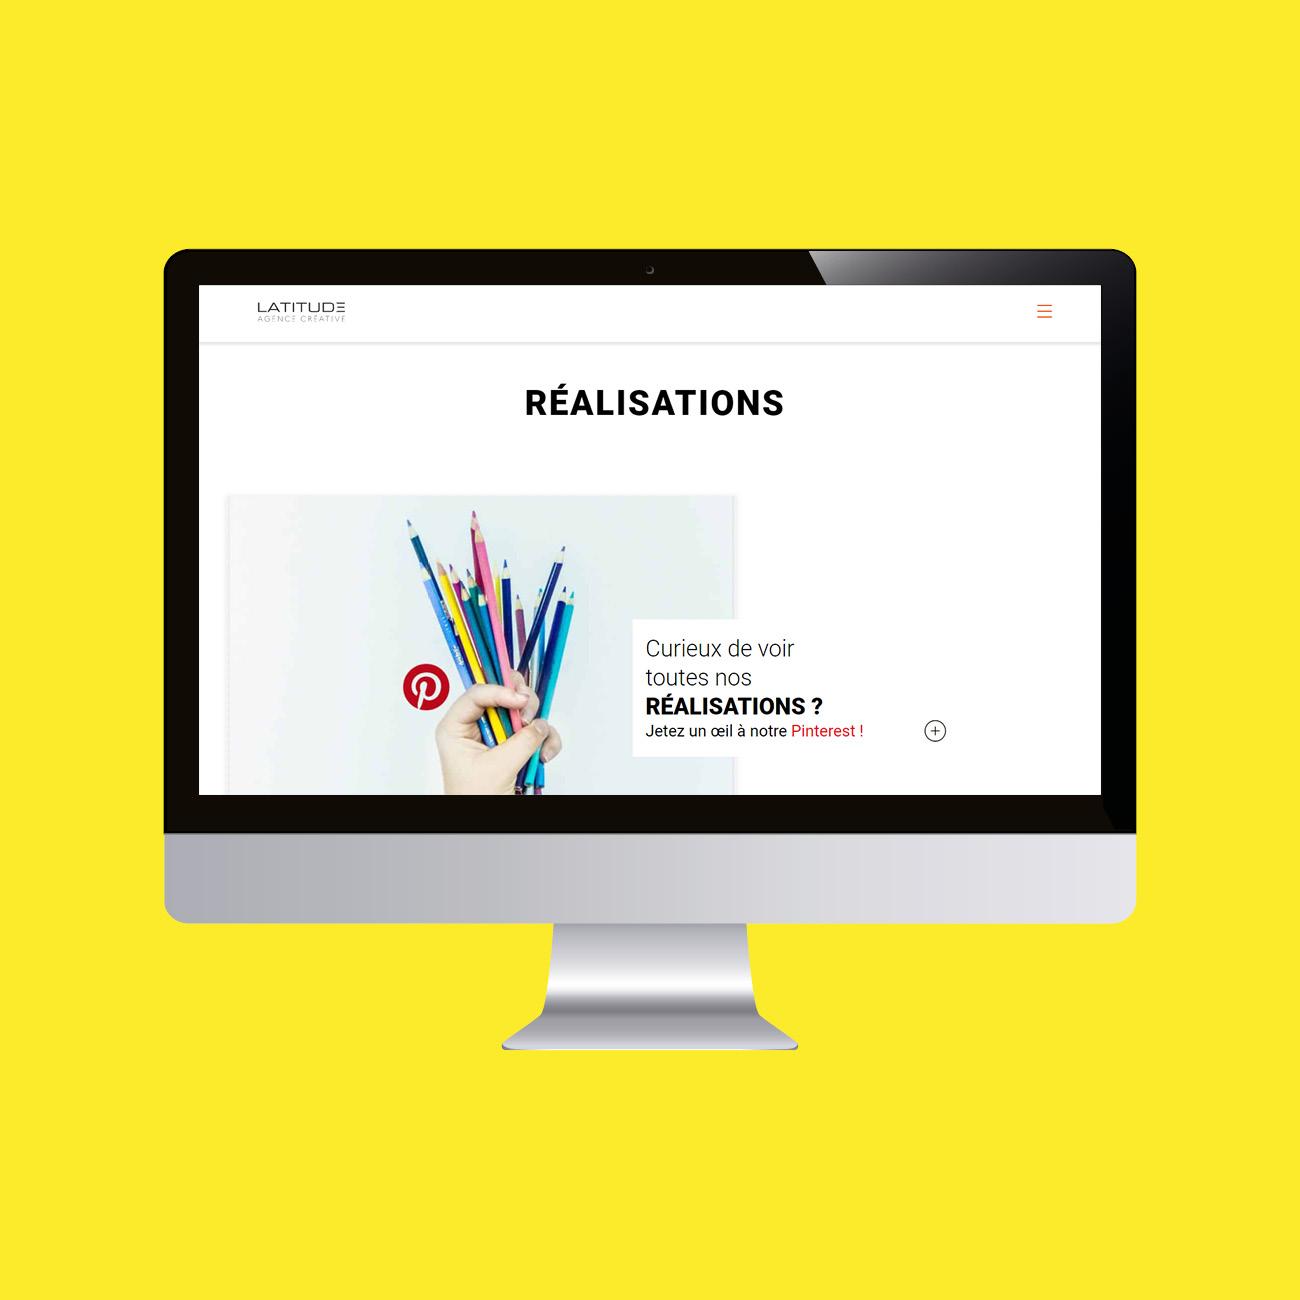 Miko Digital Agence web à Liège - Création site web Liège Latitude